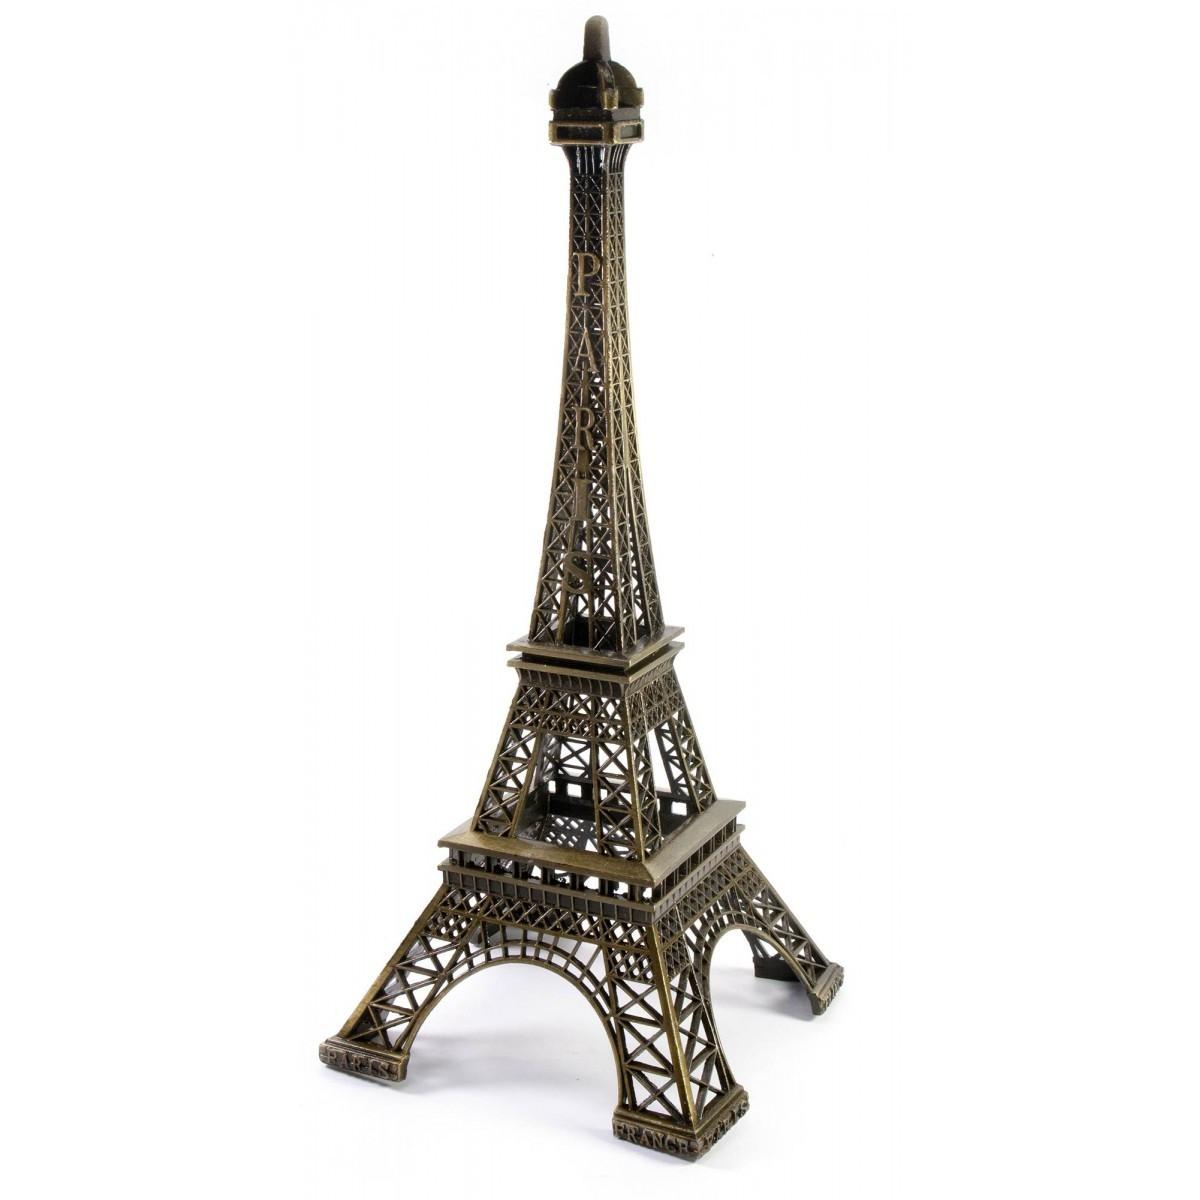 Настольная статуэтка Эйфелева Башня